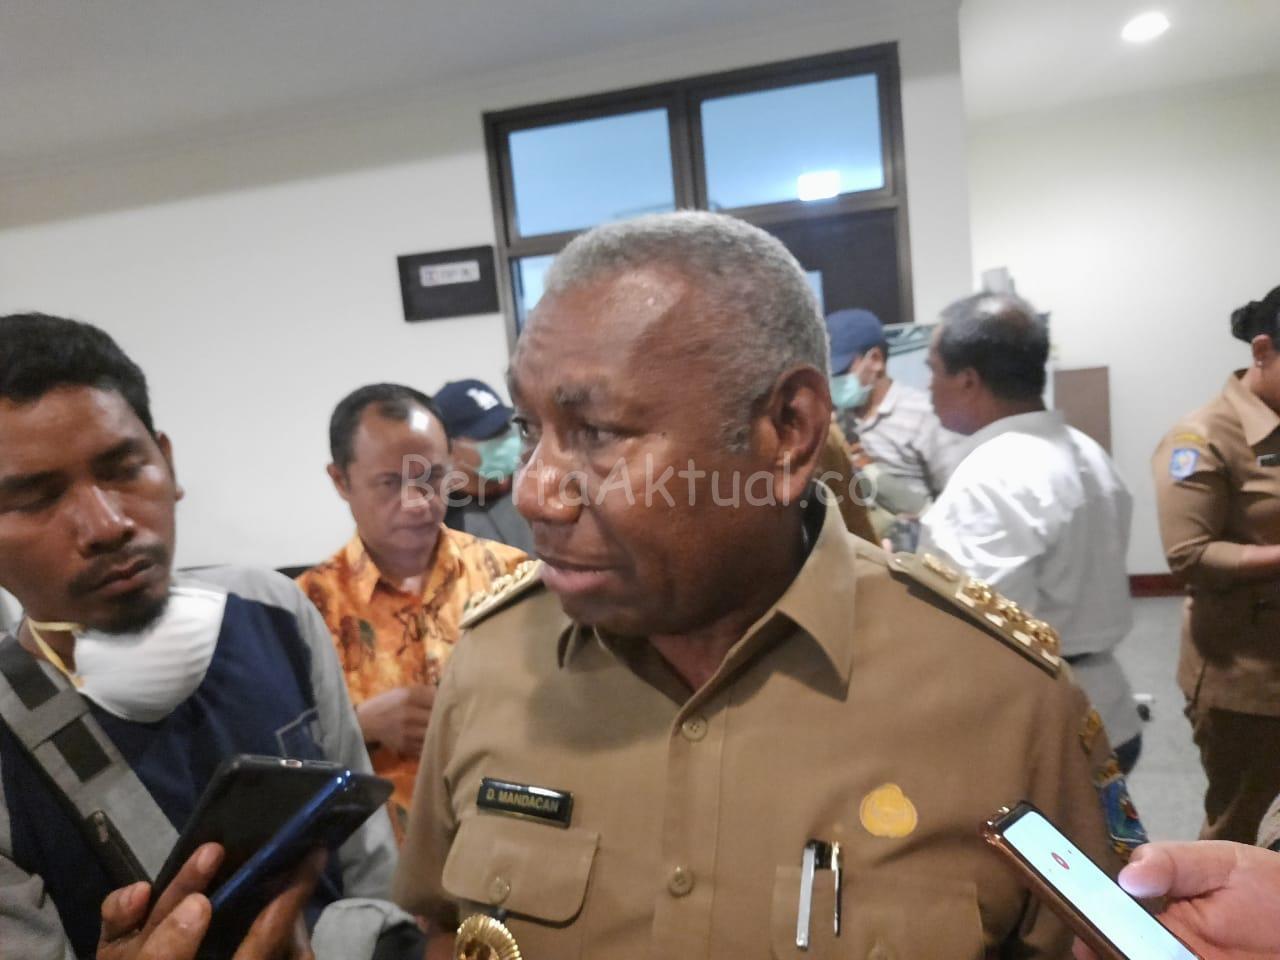 Gubernur: Jika Papua Barat Lockdown Perekonomian Akan Goyah 1 IMG 20200325 WA0004